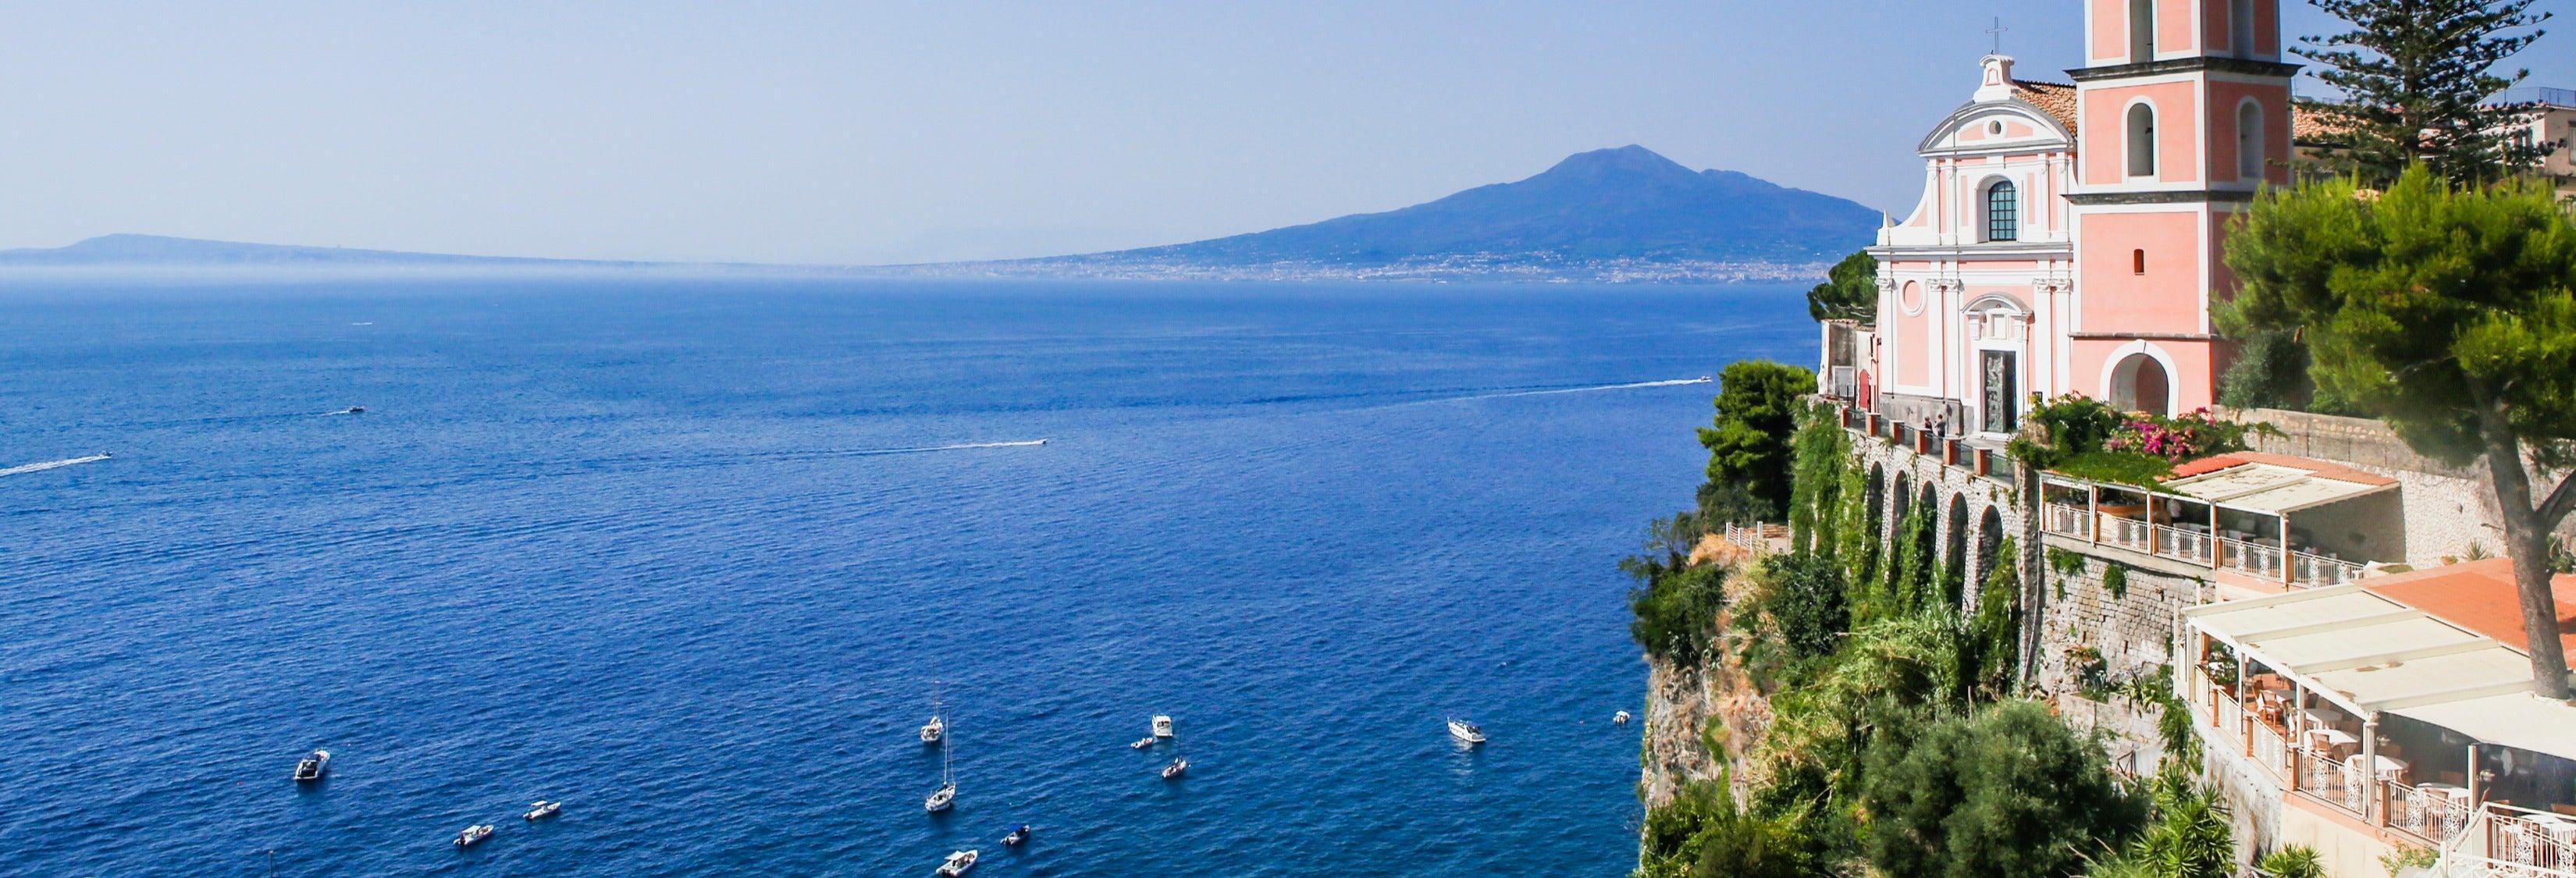 Paseo en barco por la península de Sorrento